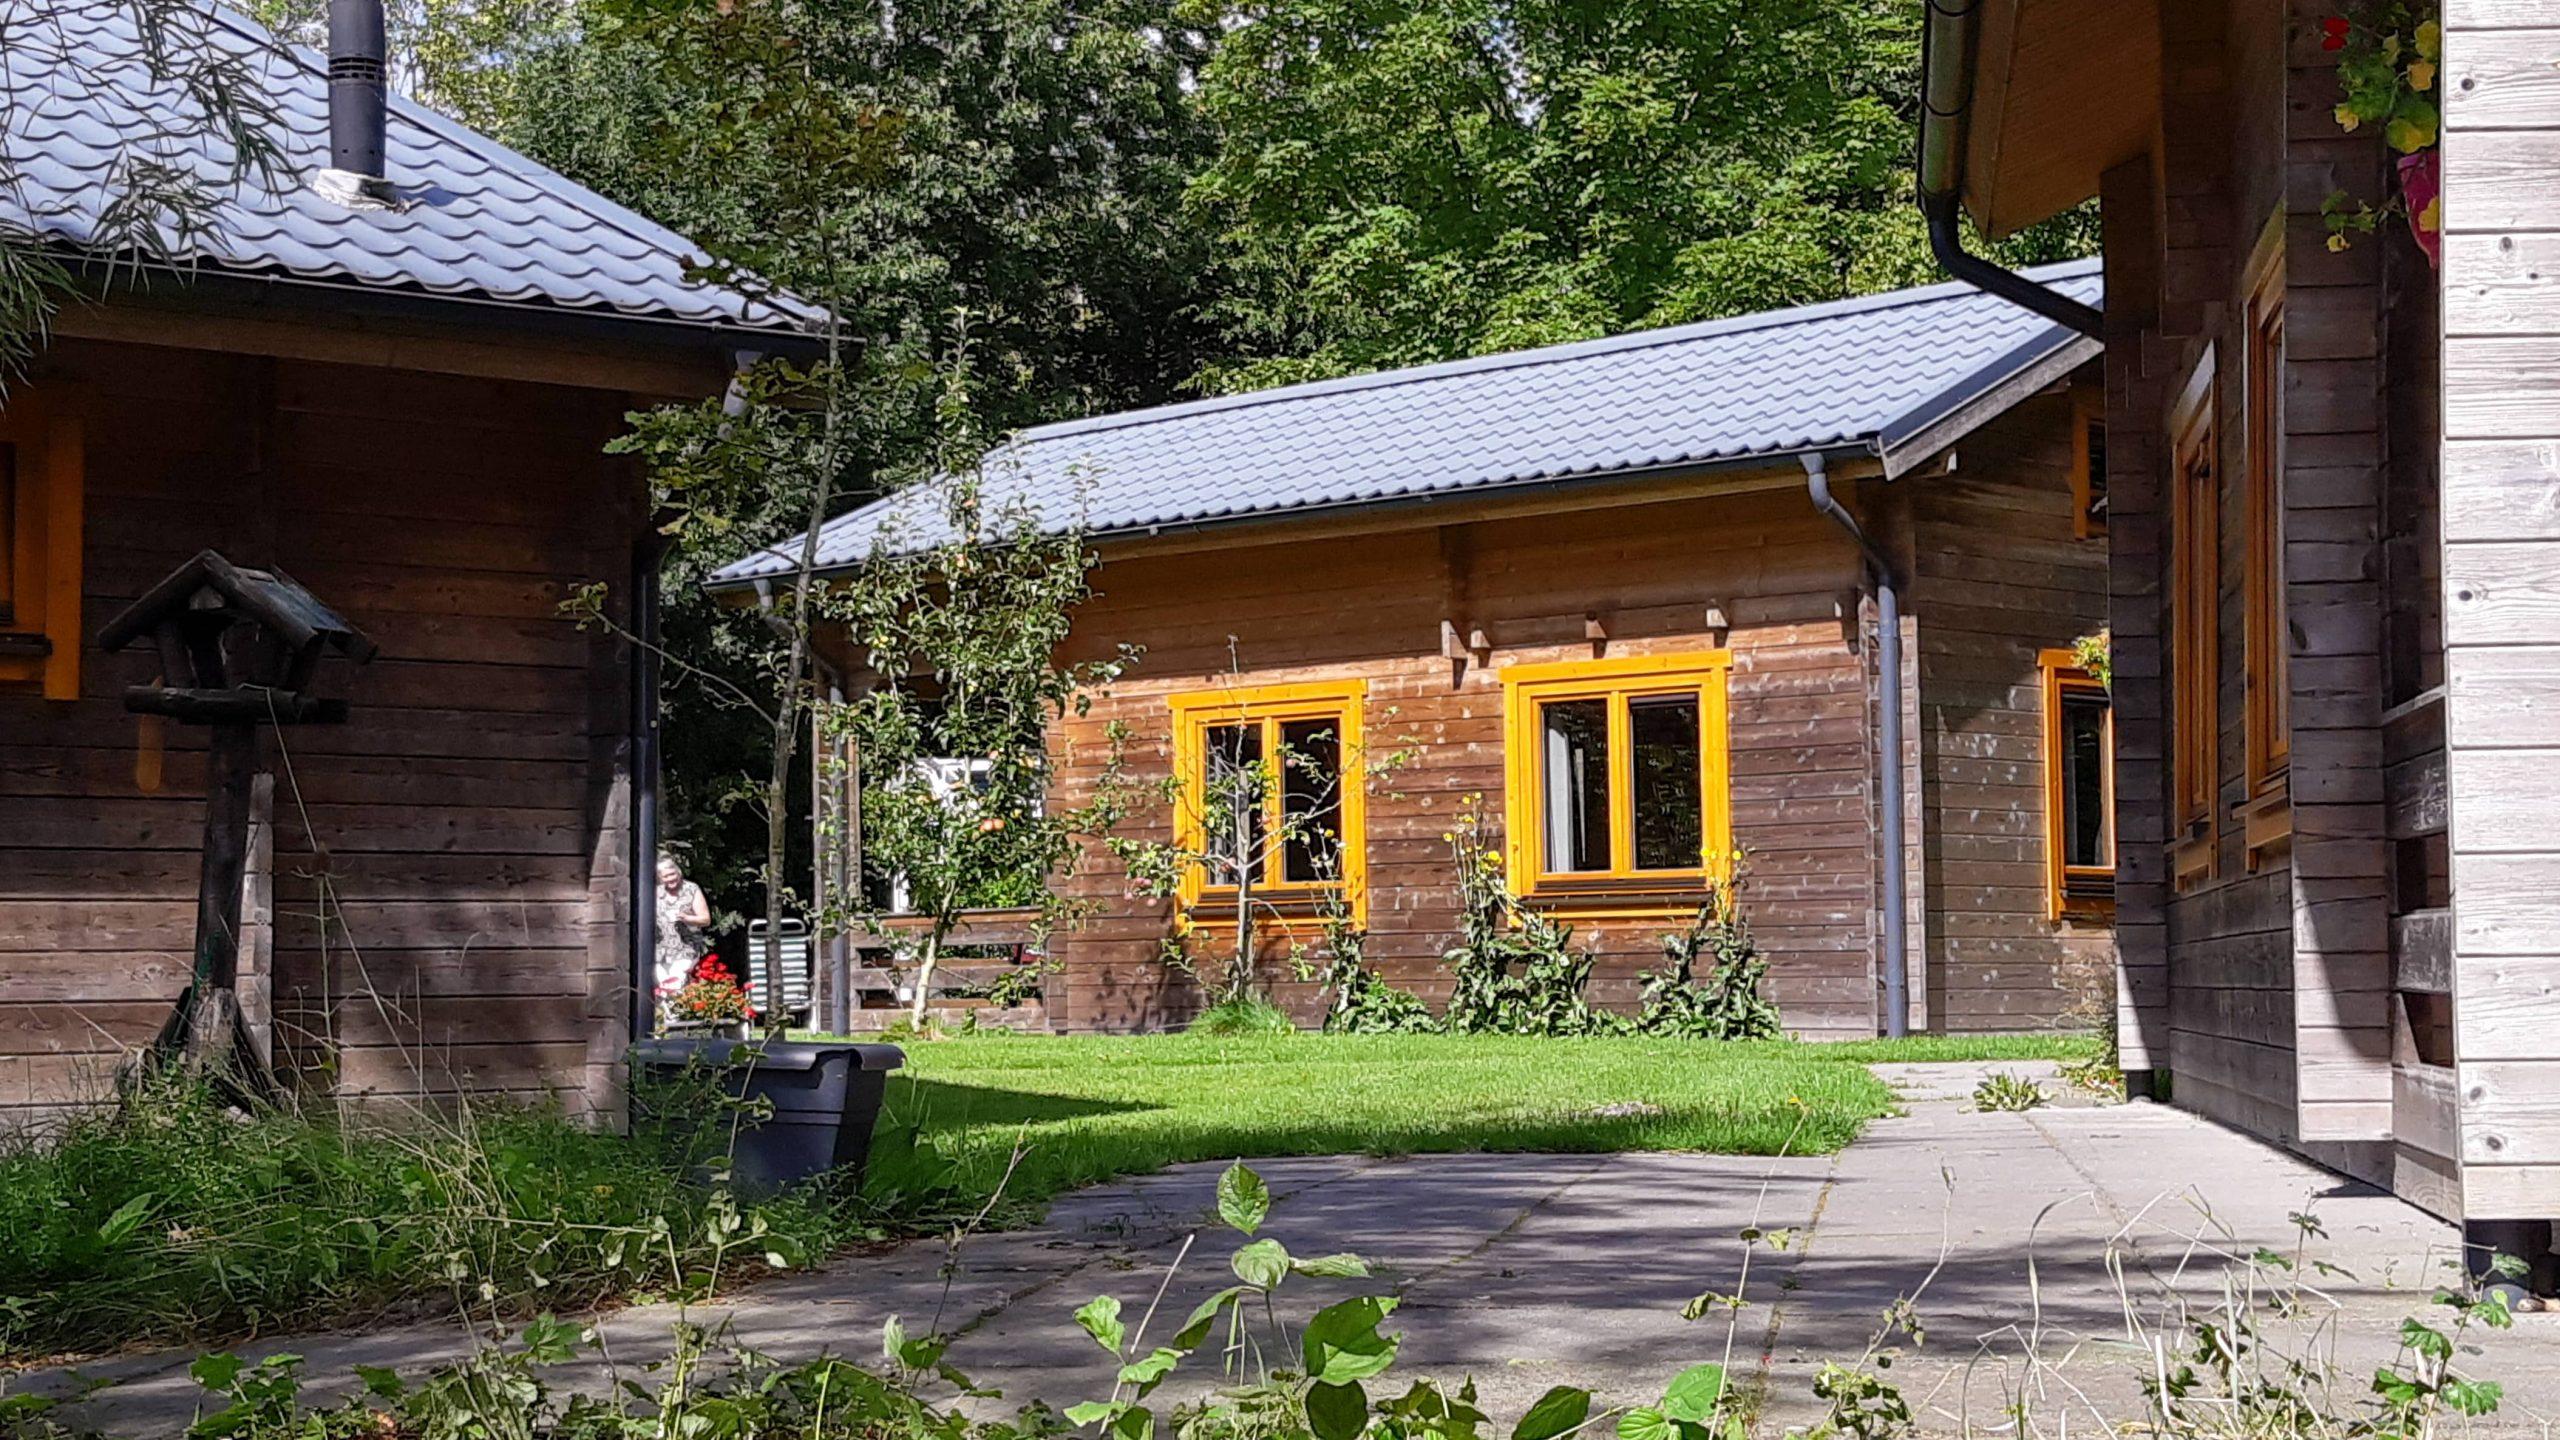 Doorkijk bij houten blokhuizen camping t Ol Gat